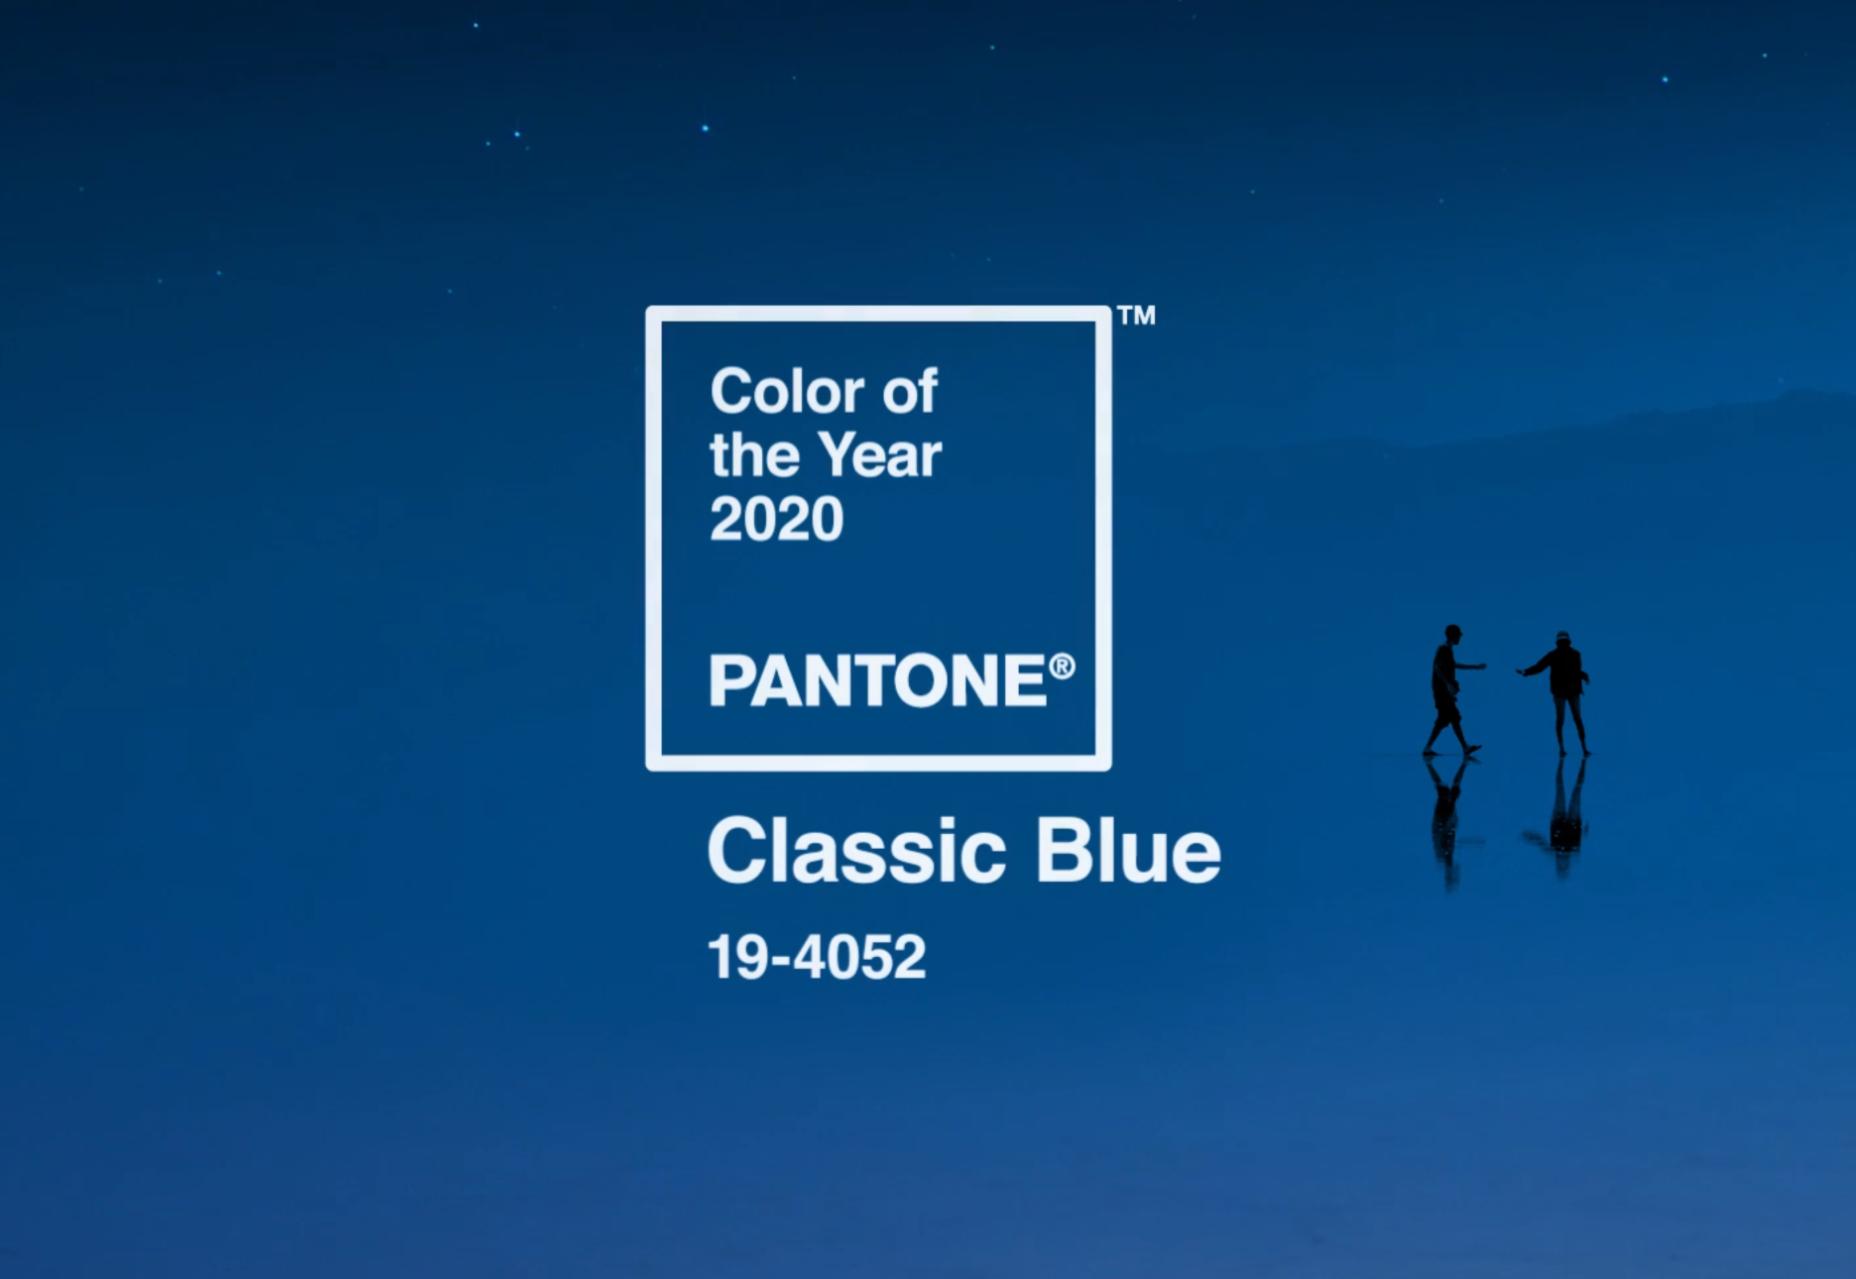 PANTONE ANUNCIA SUA COR DE 2020